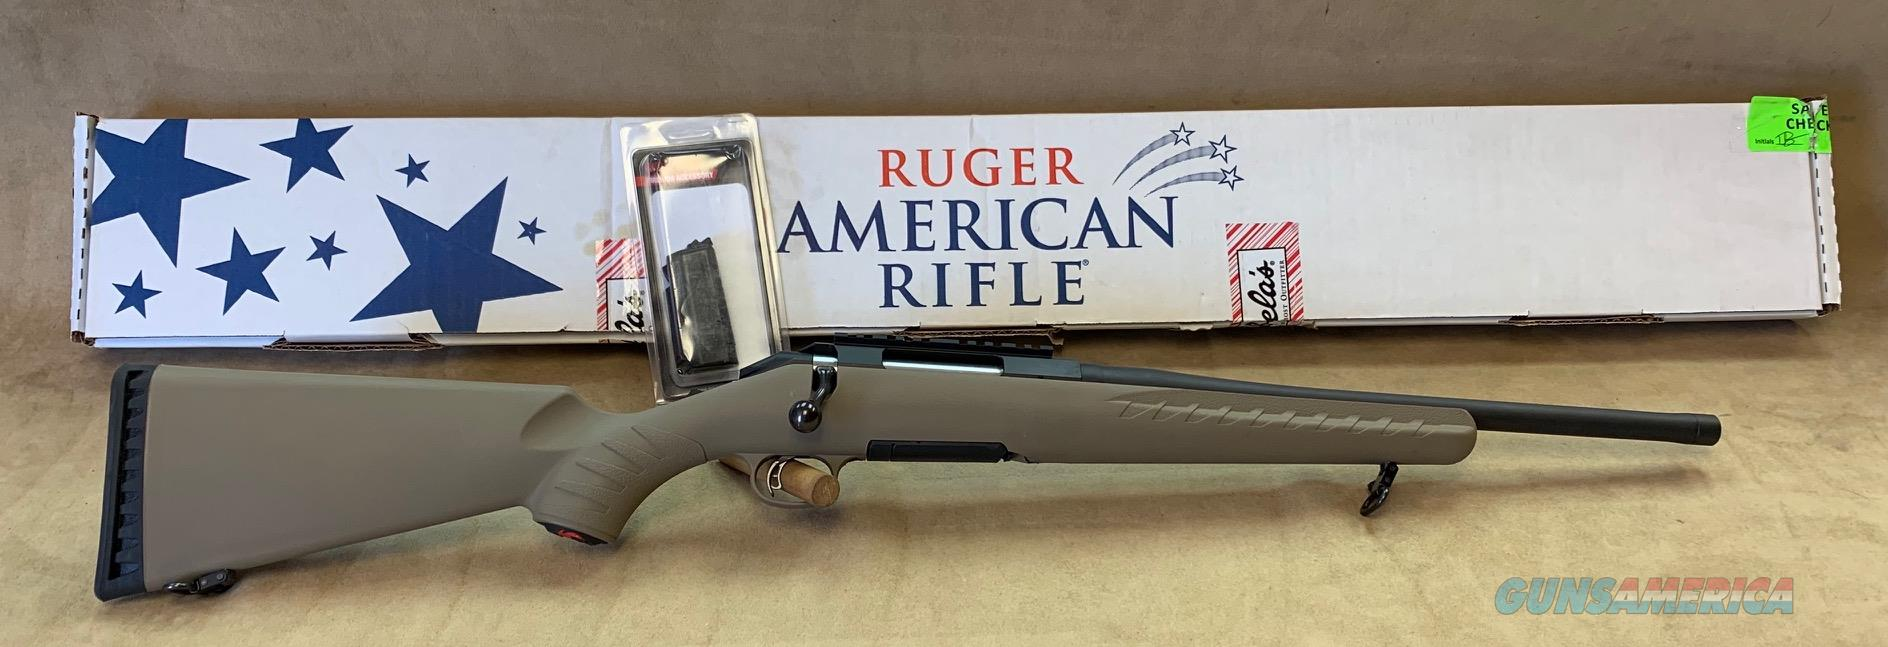 6968 Ruger American Ranch 300 Blackout + extra mag  Guns > Rifles > Ruger Rifles > American Rifle